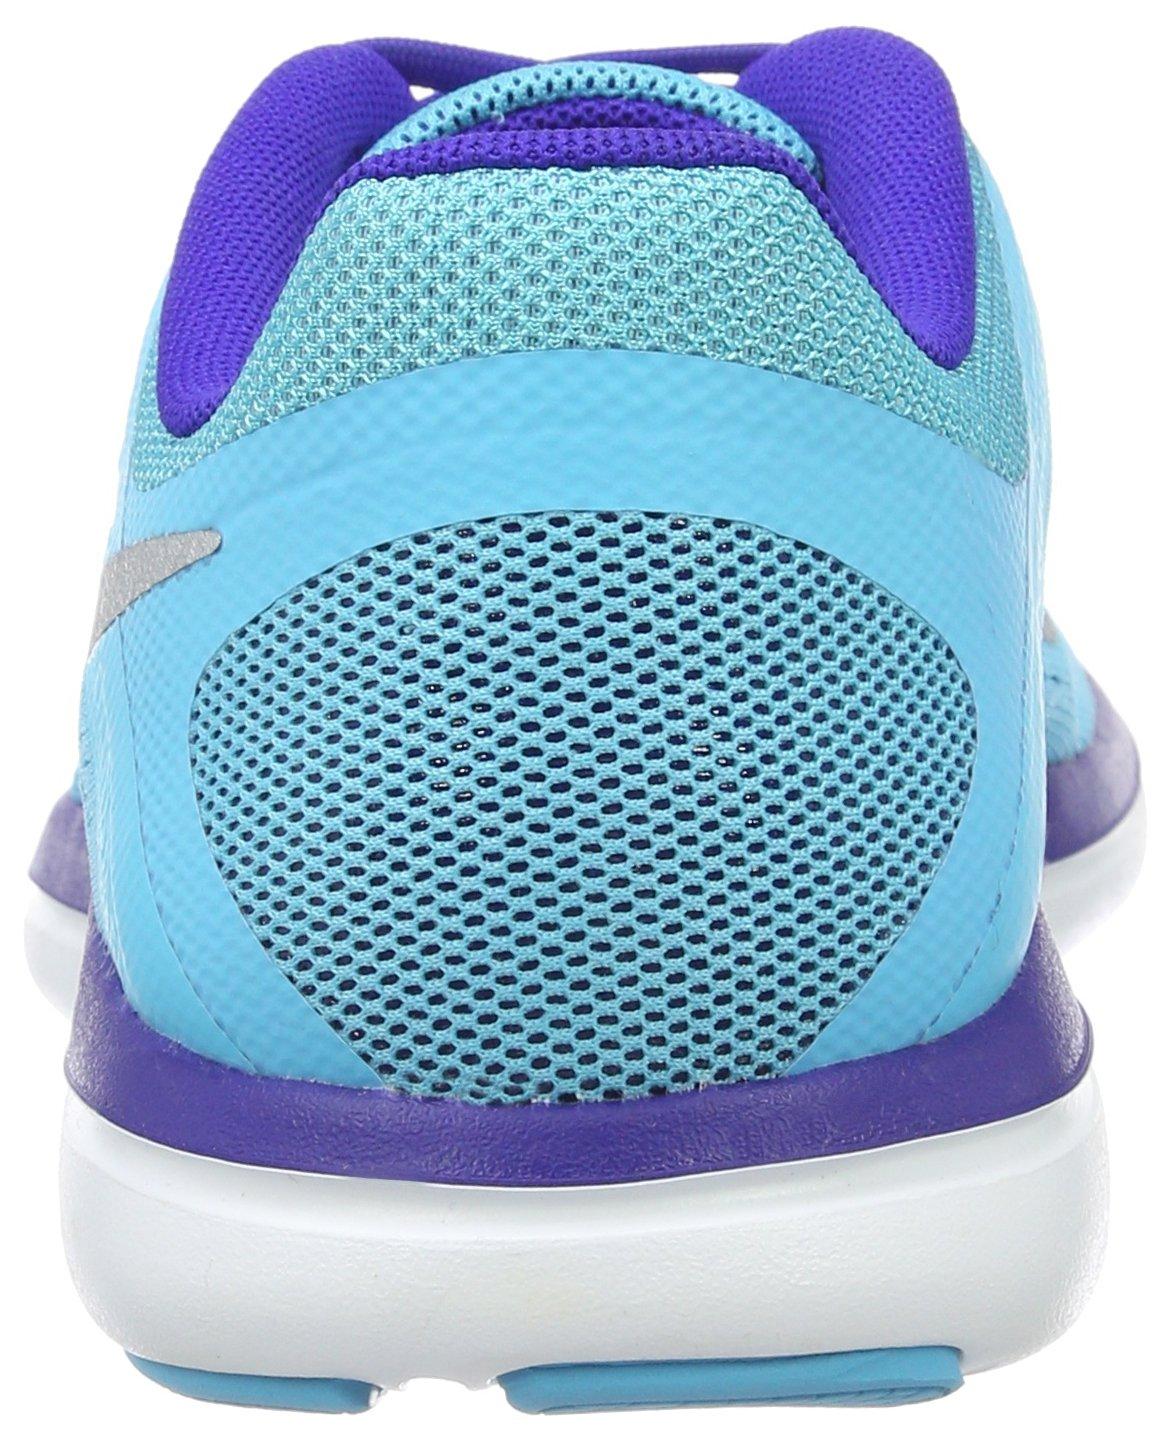 NIKE Women's Flex 2016 Rn Running Shoes B005OB747M Silver/Concord 10 B(M) US Gamma Blue/Metallic Silver/Concord B005OB747M bf0e1b